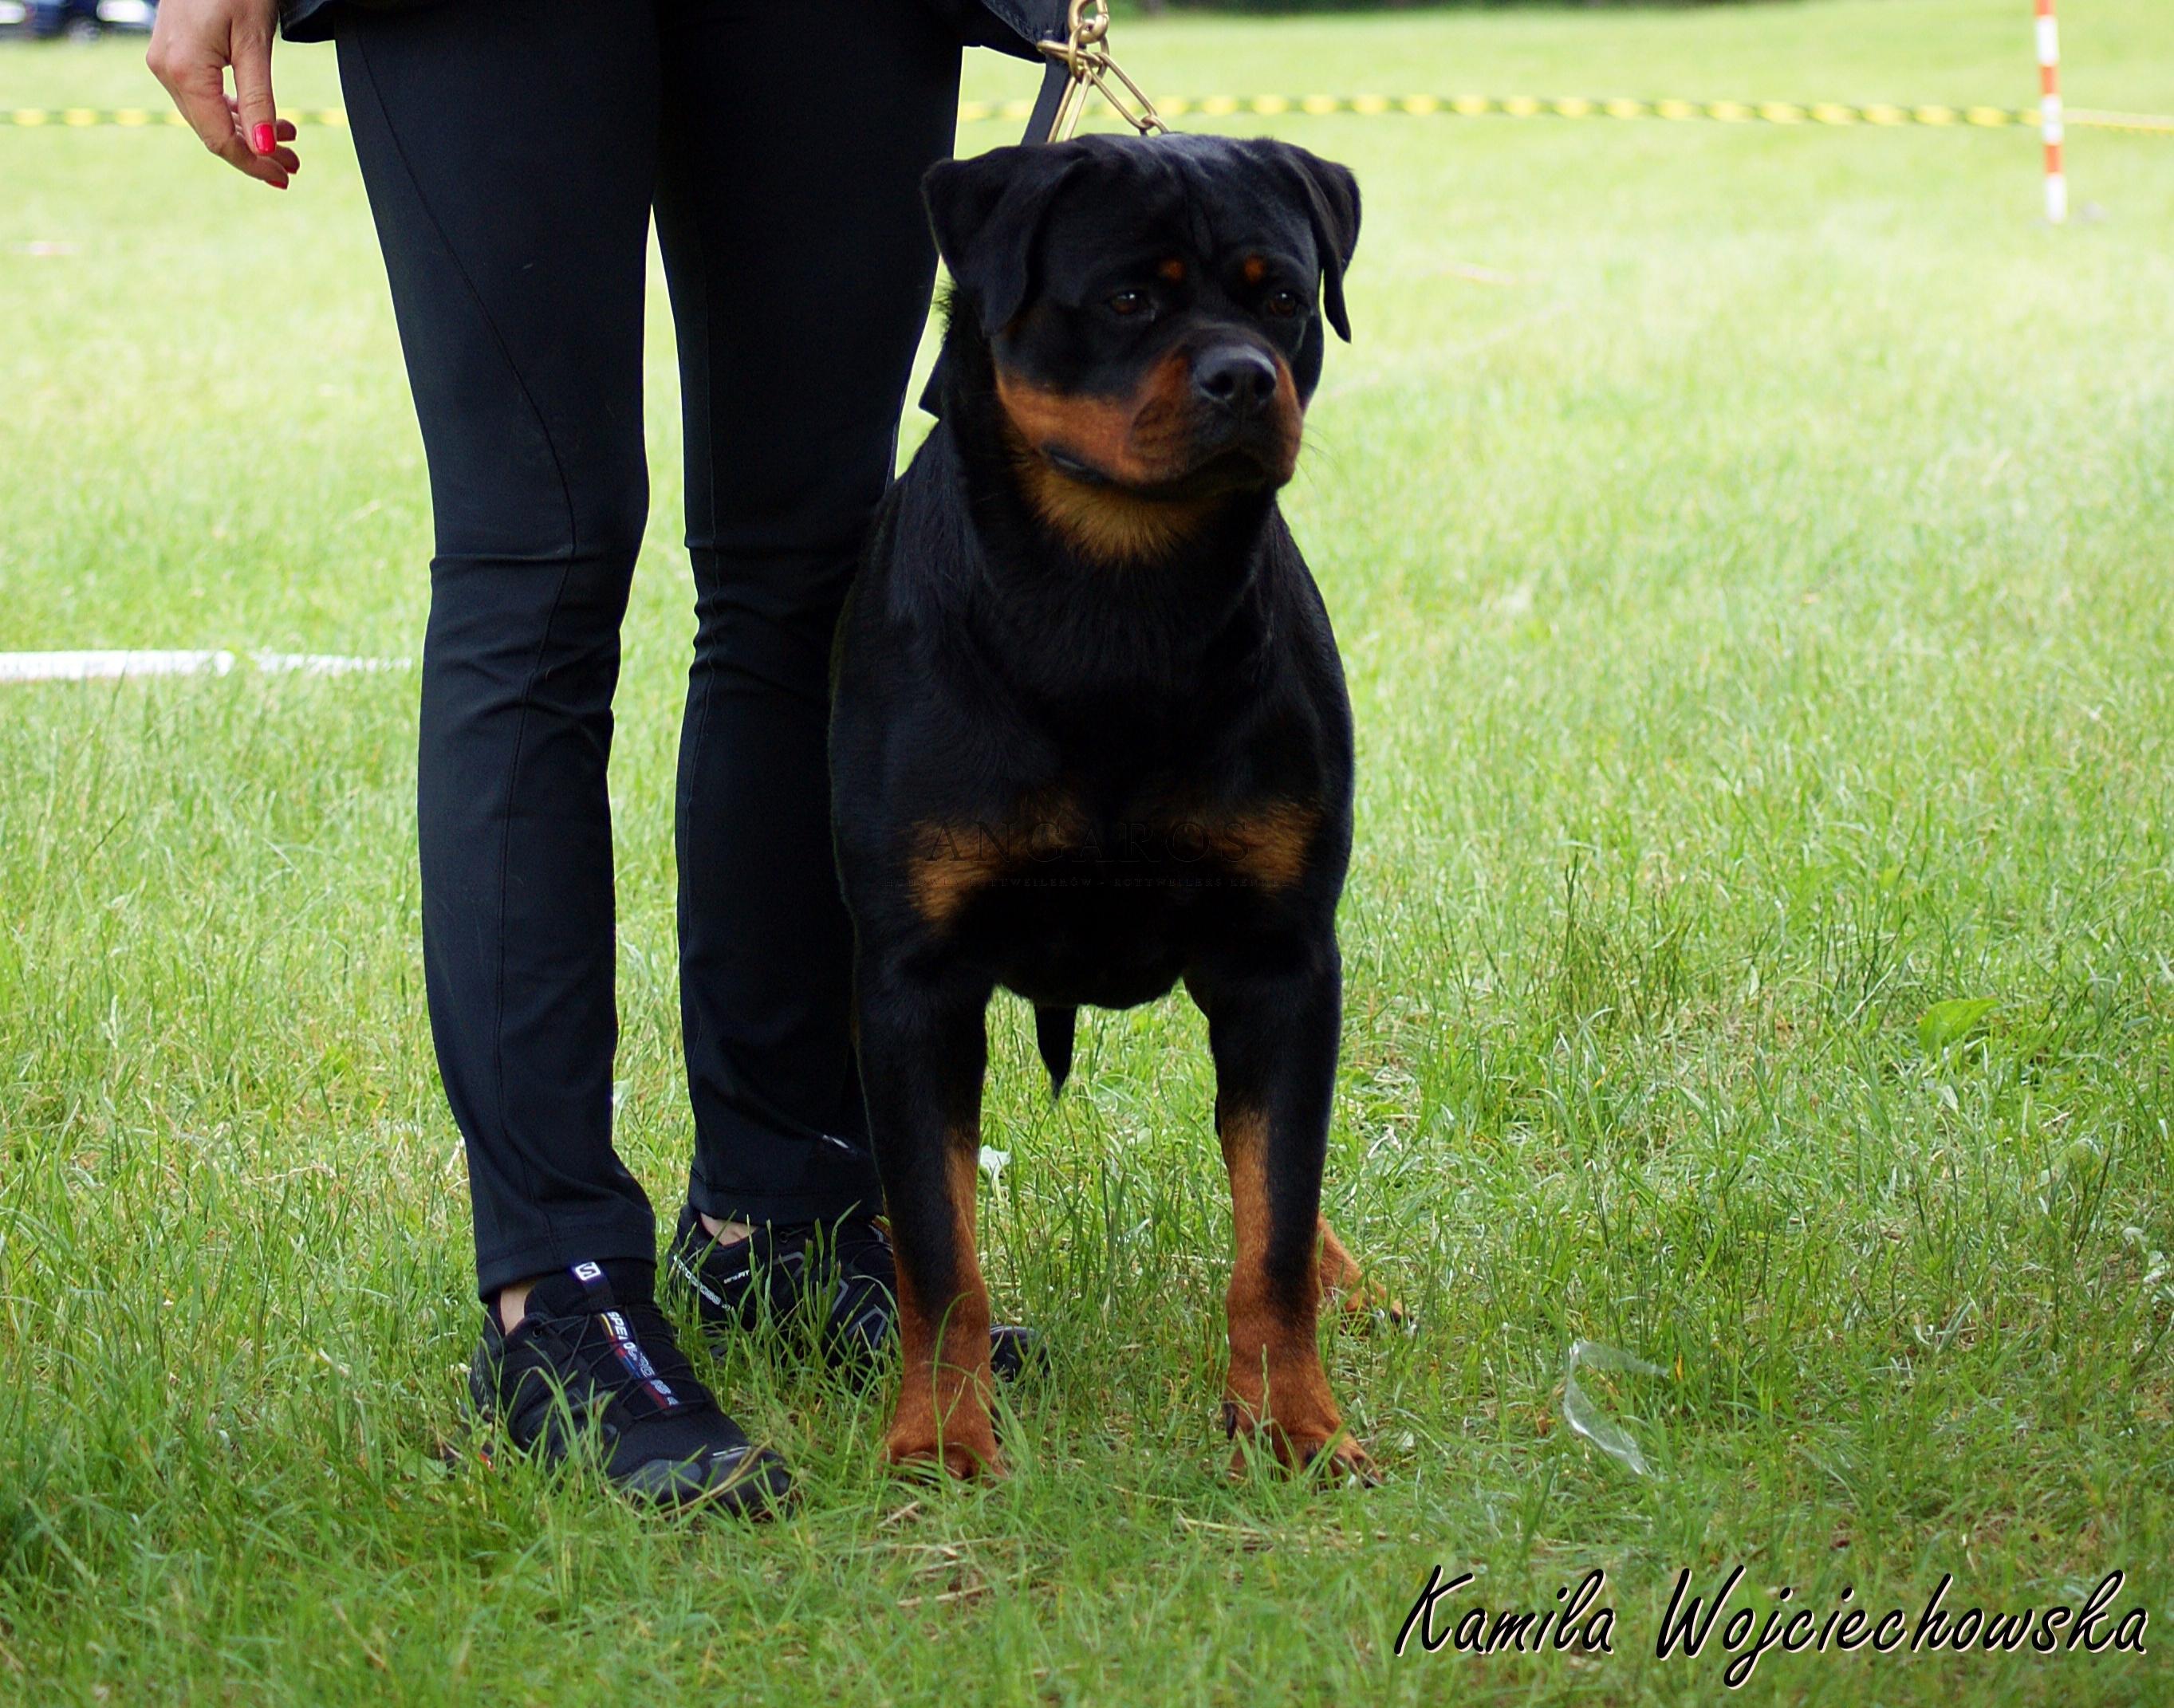 MERCEDES FOR ANGAROS Darel | Rottweiler - Hodowla Rottweilerów Angaros - Rottweilers - Rottweilery